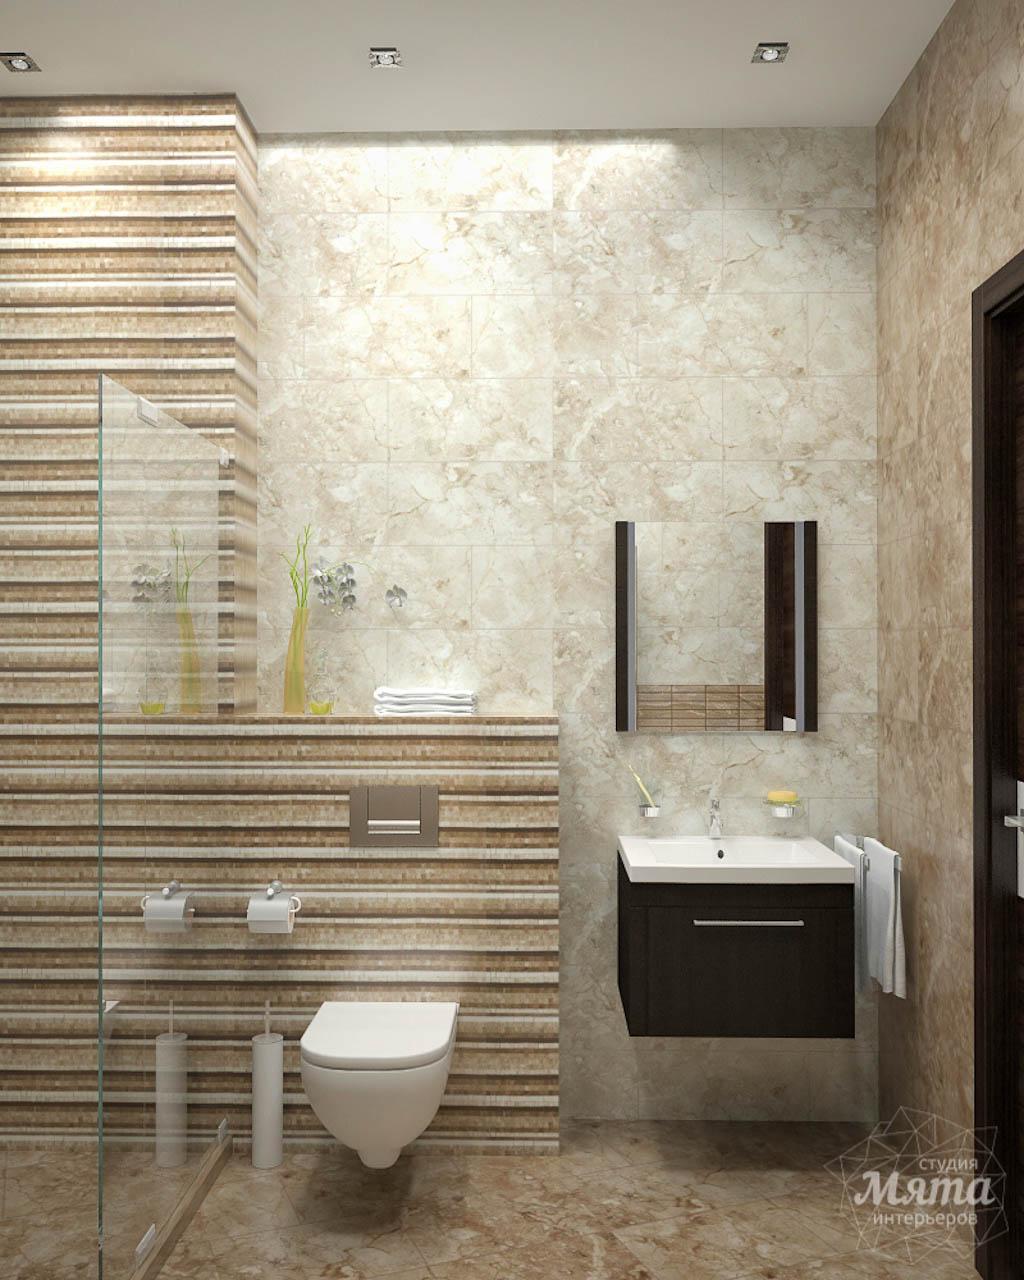 Дизайн проект интерьера коттеджа  в стиле минимализм по ул. Барвинка 15 img1021709348